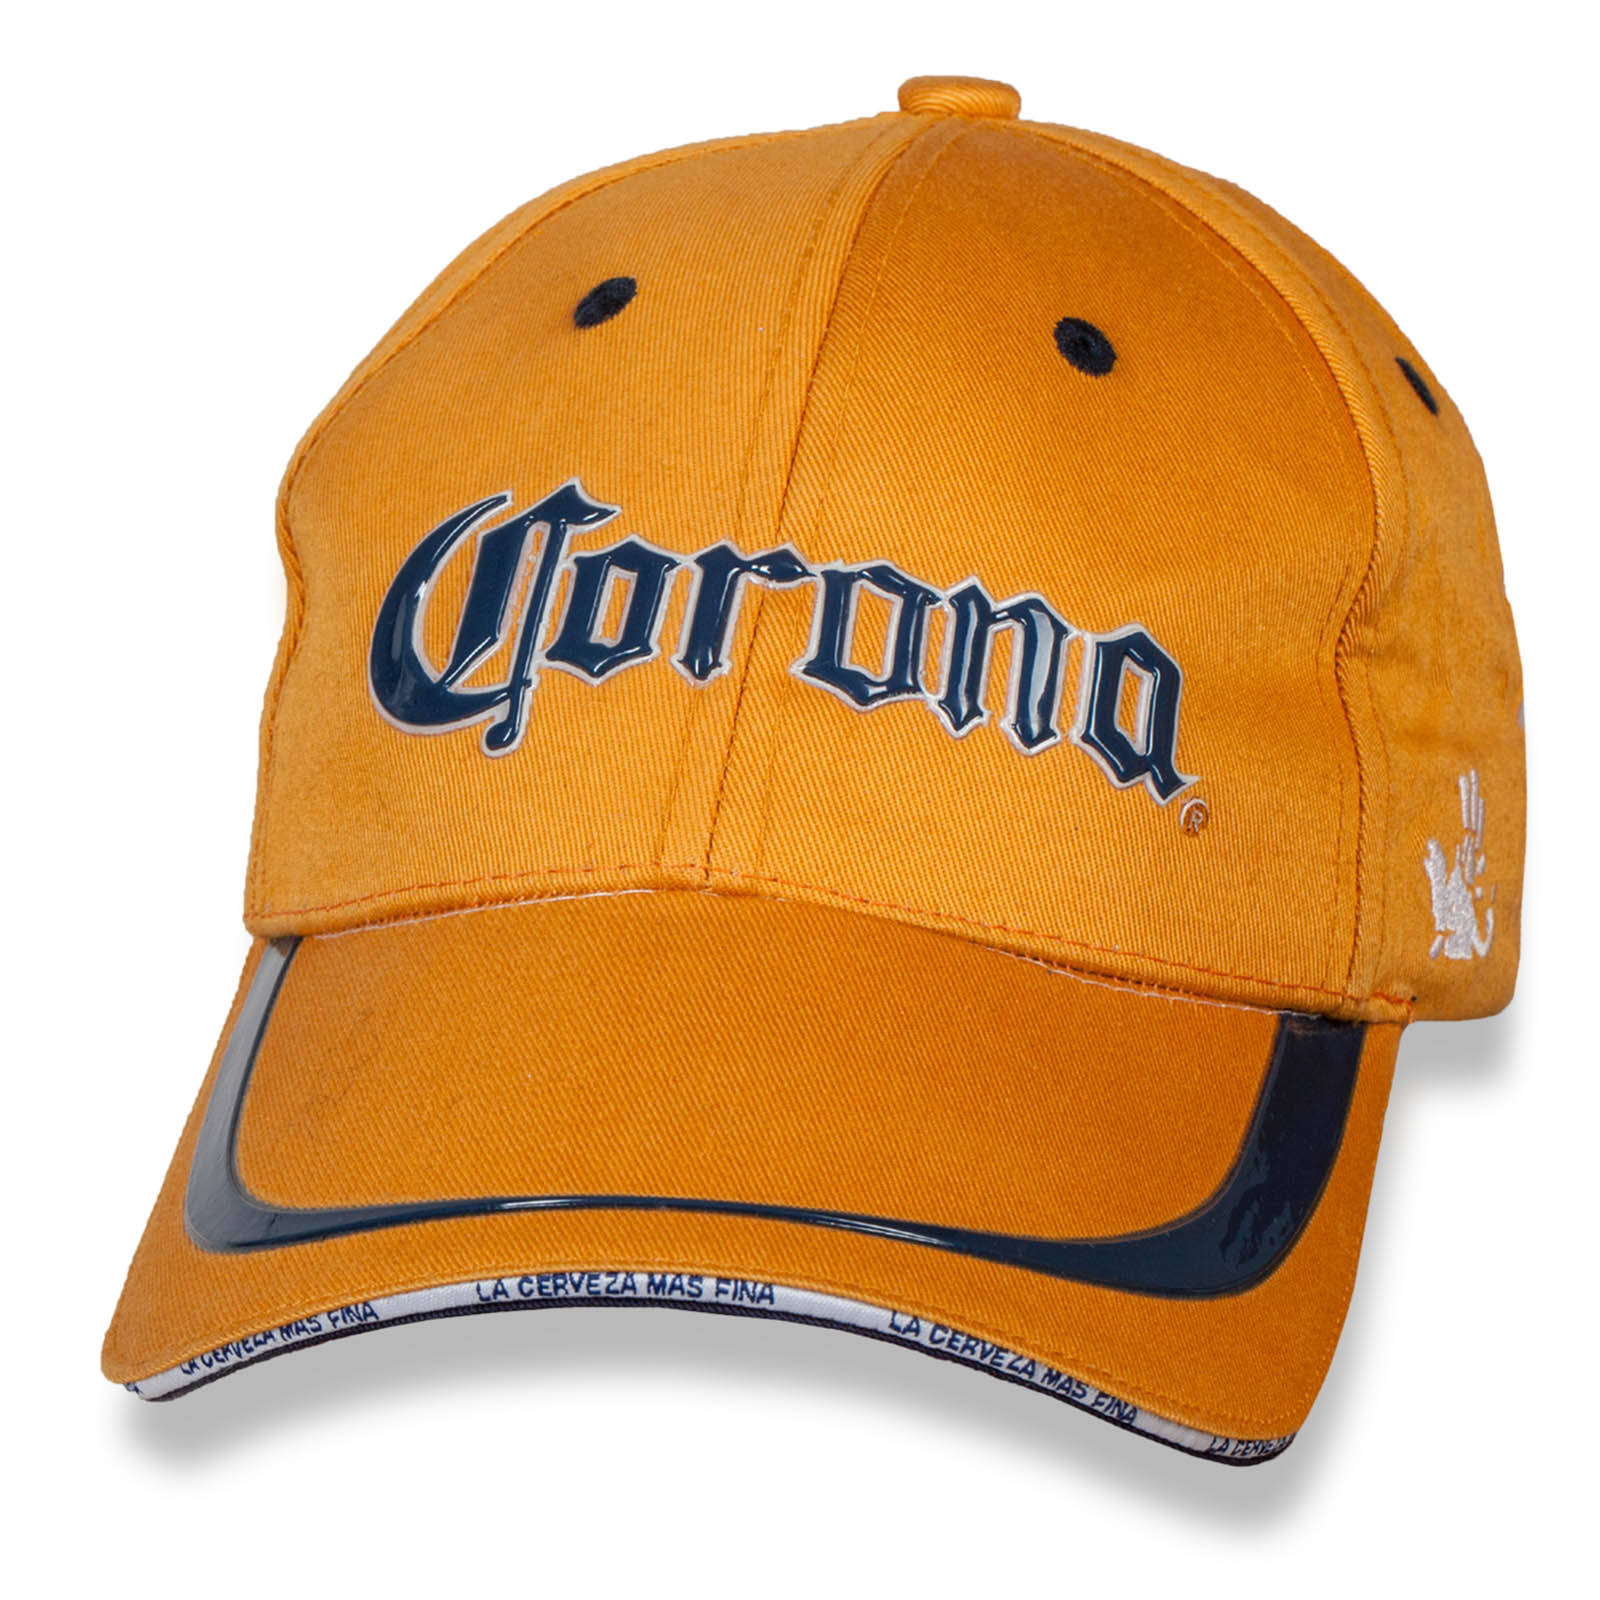 Позитивная бейсболка Corona